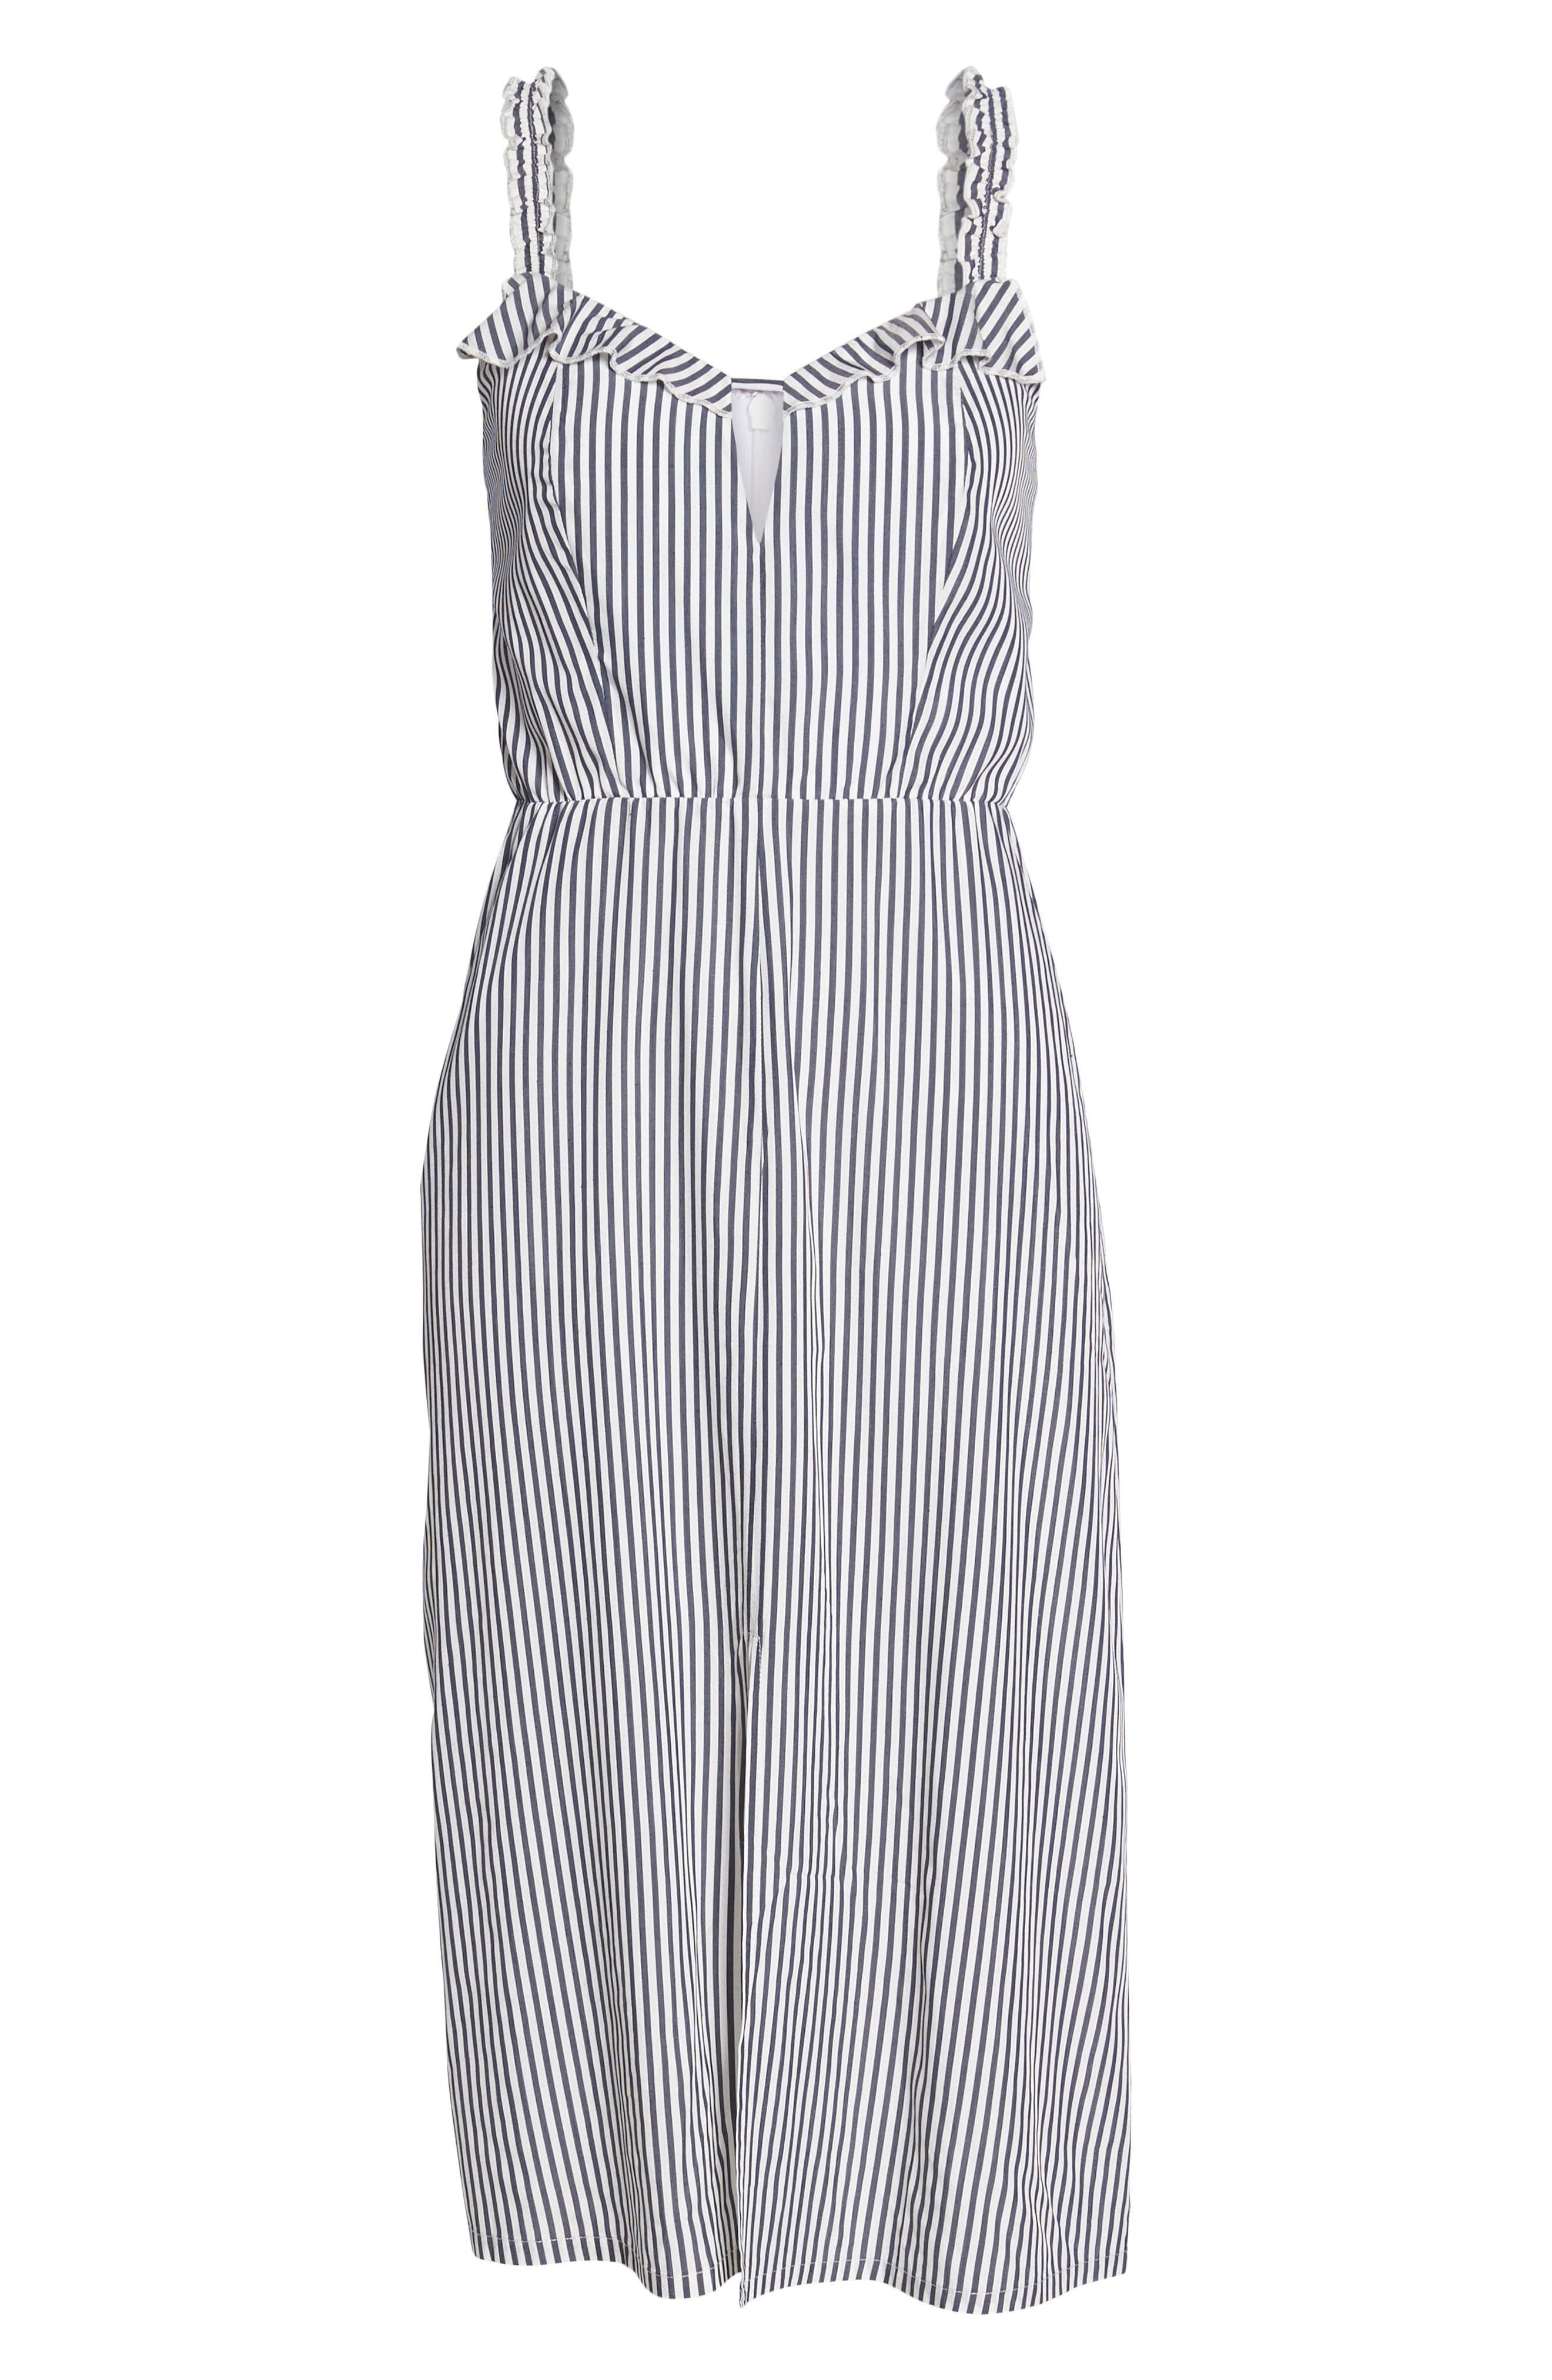 Drinks On Me Stripe Ruffle Midi Dress,                             Alternate thumbnail 6, color,                             Navy/ White Mini Stripe